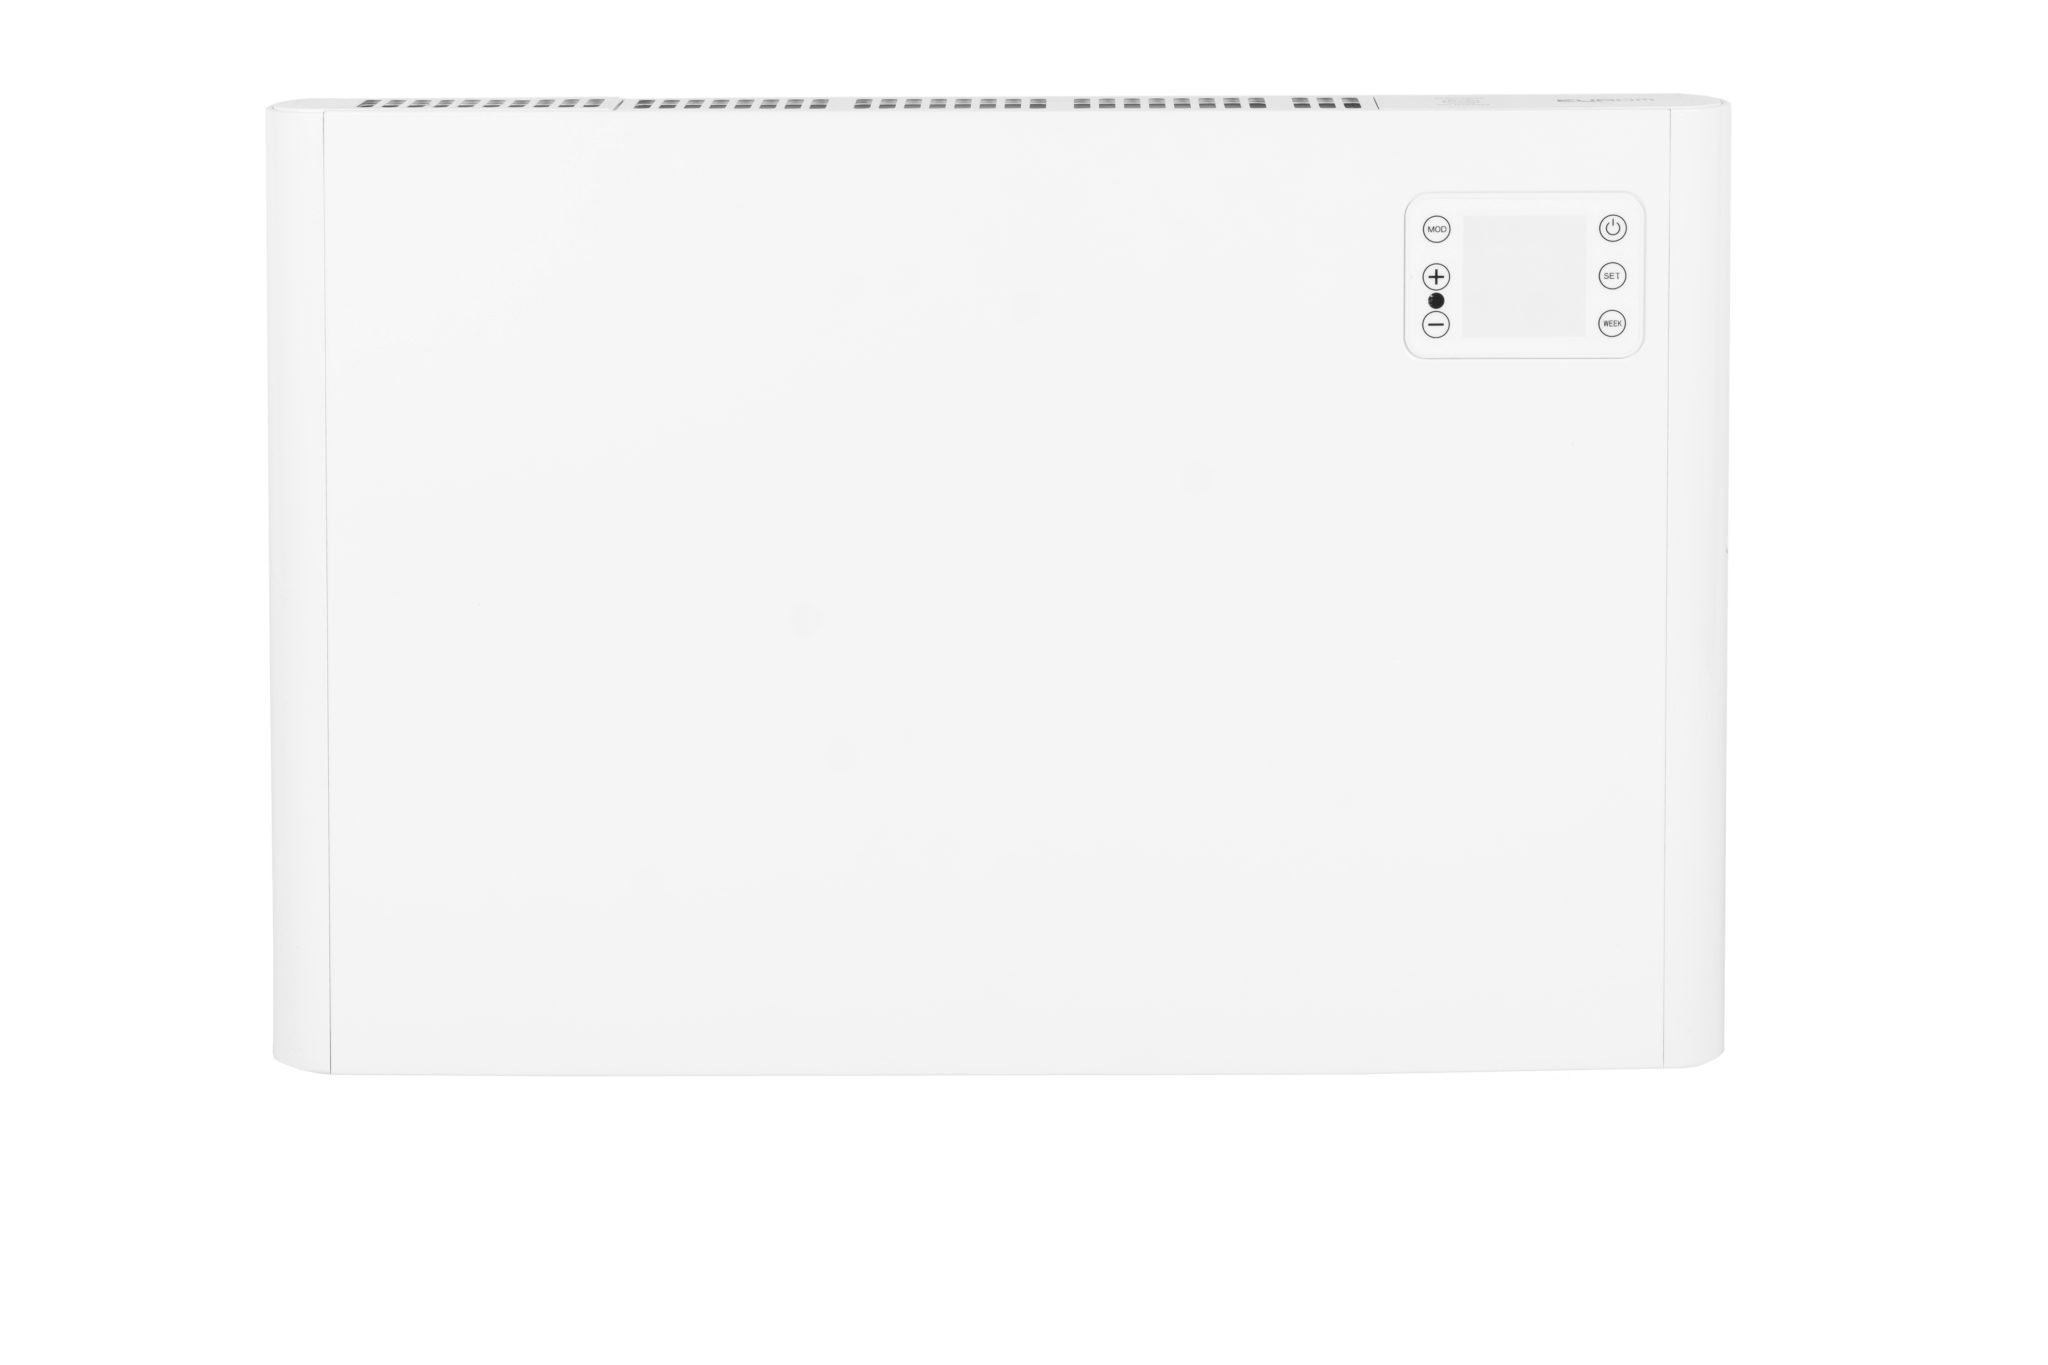 Eurom Alutherm 1000 WiFi Convectorkachel | Moderne Kachel met LED Display